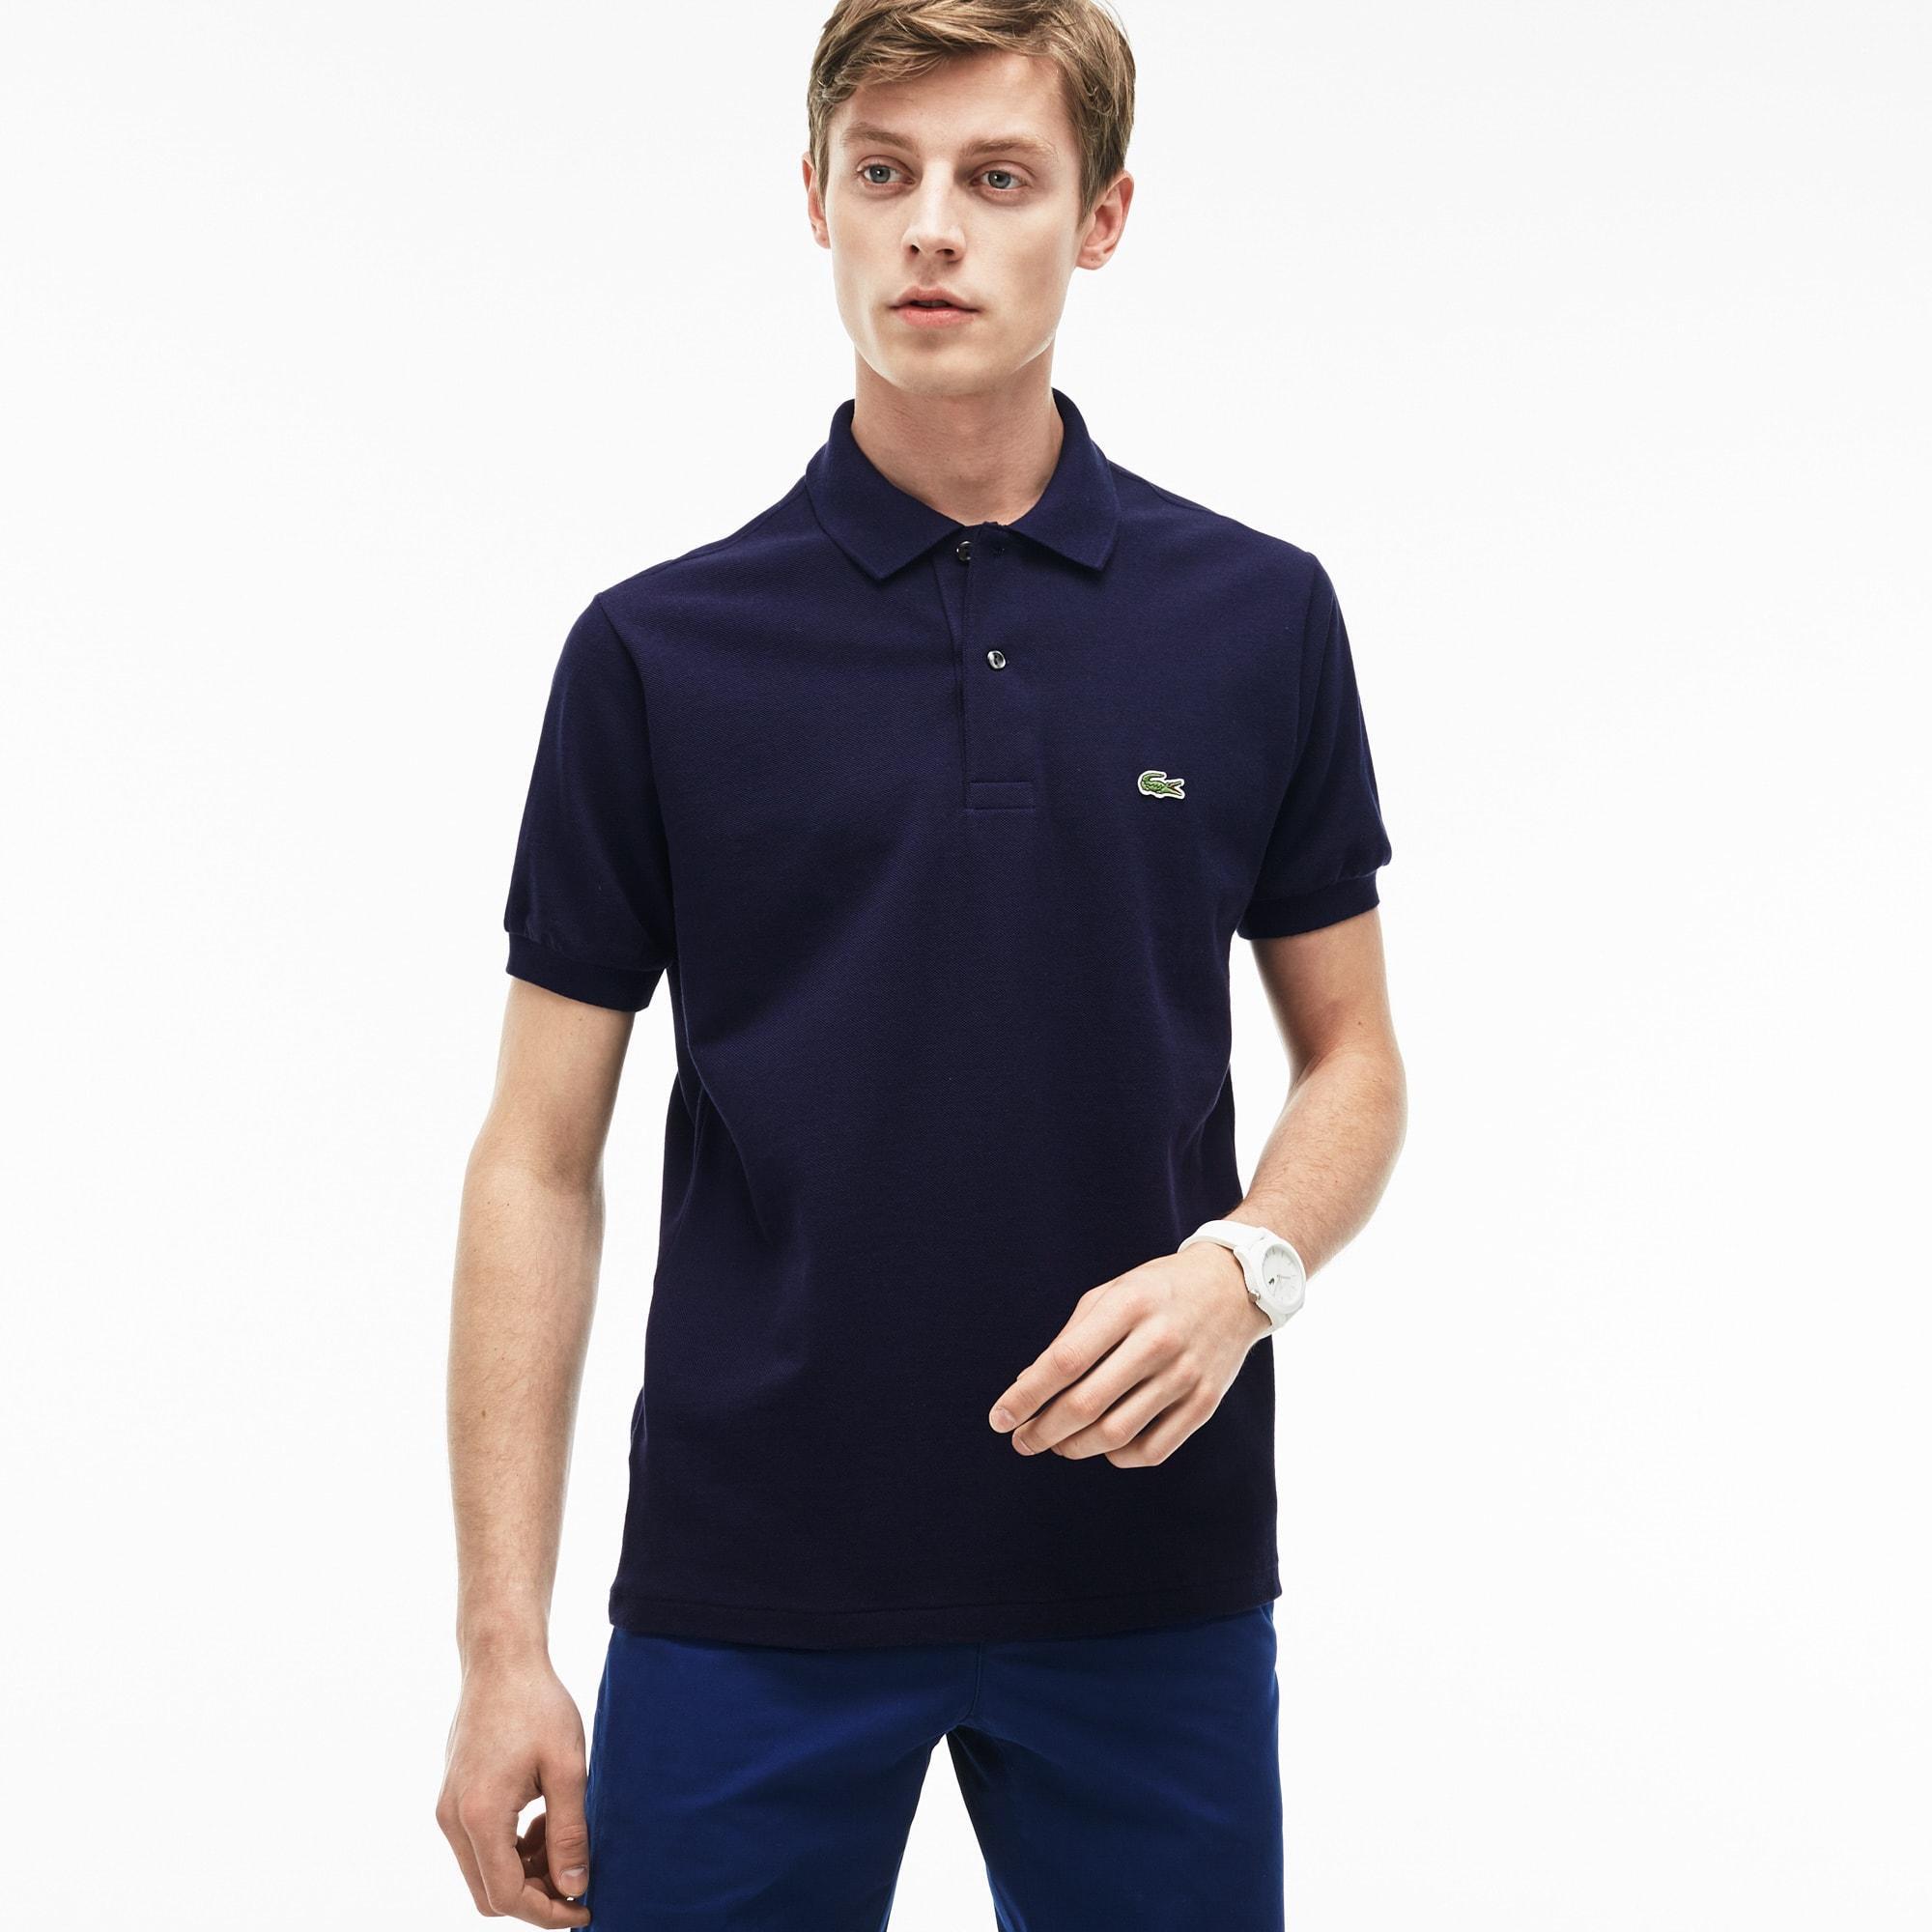 Men's Classic L.12.12 Chine Piqué Polo Shirt